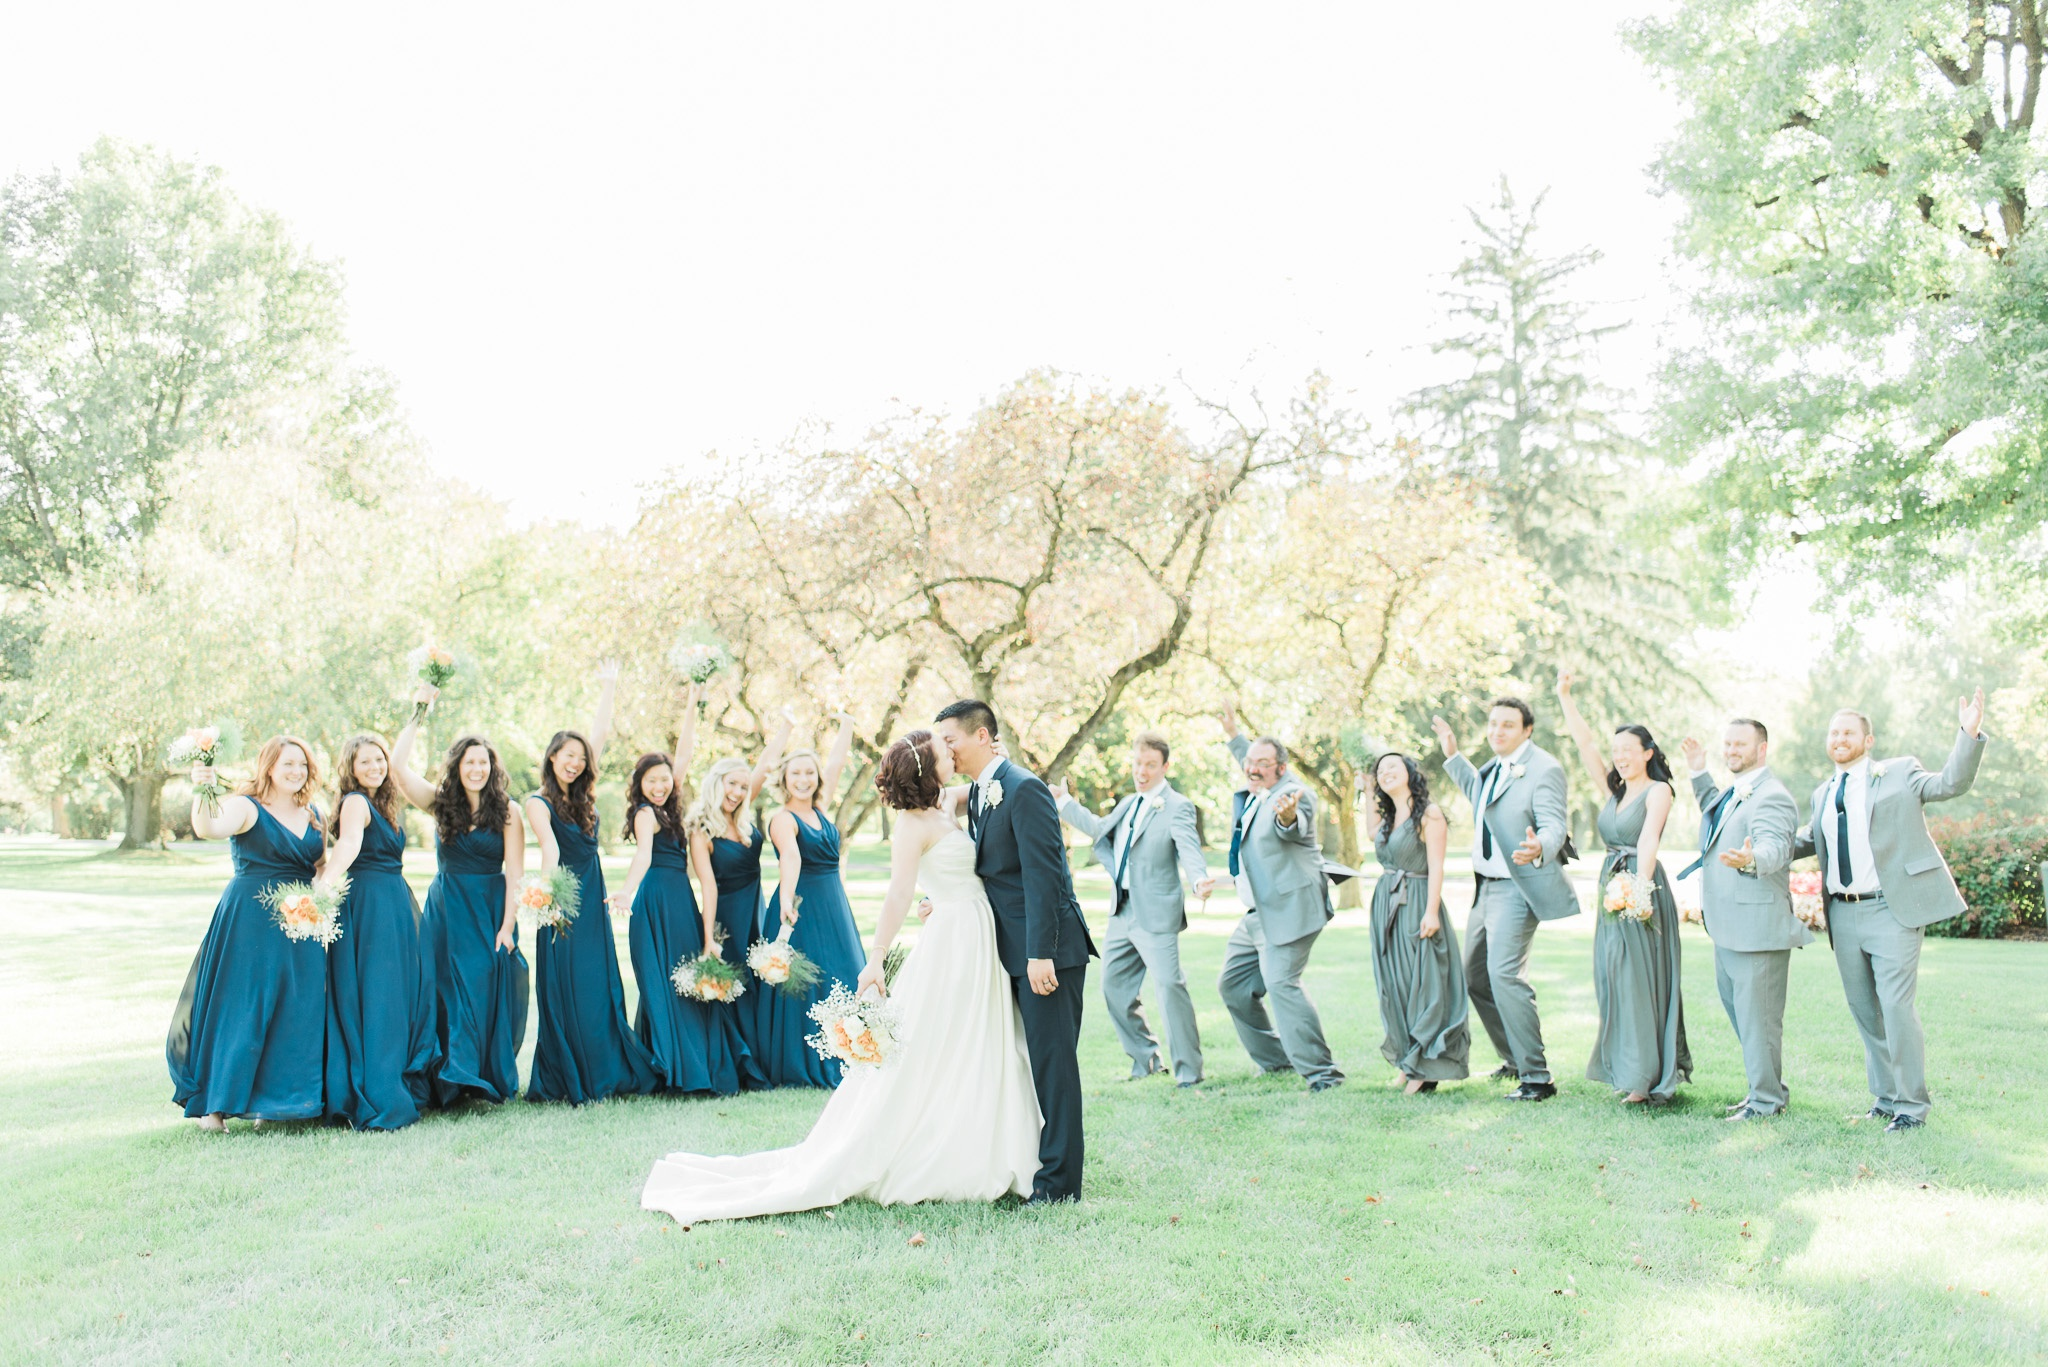 brookside-golf-country-club-wedding-columbus-ohio-76.jpg